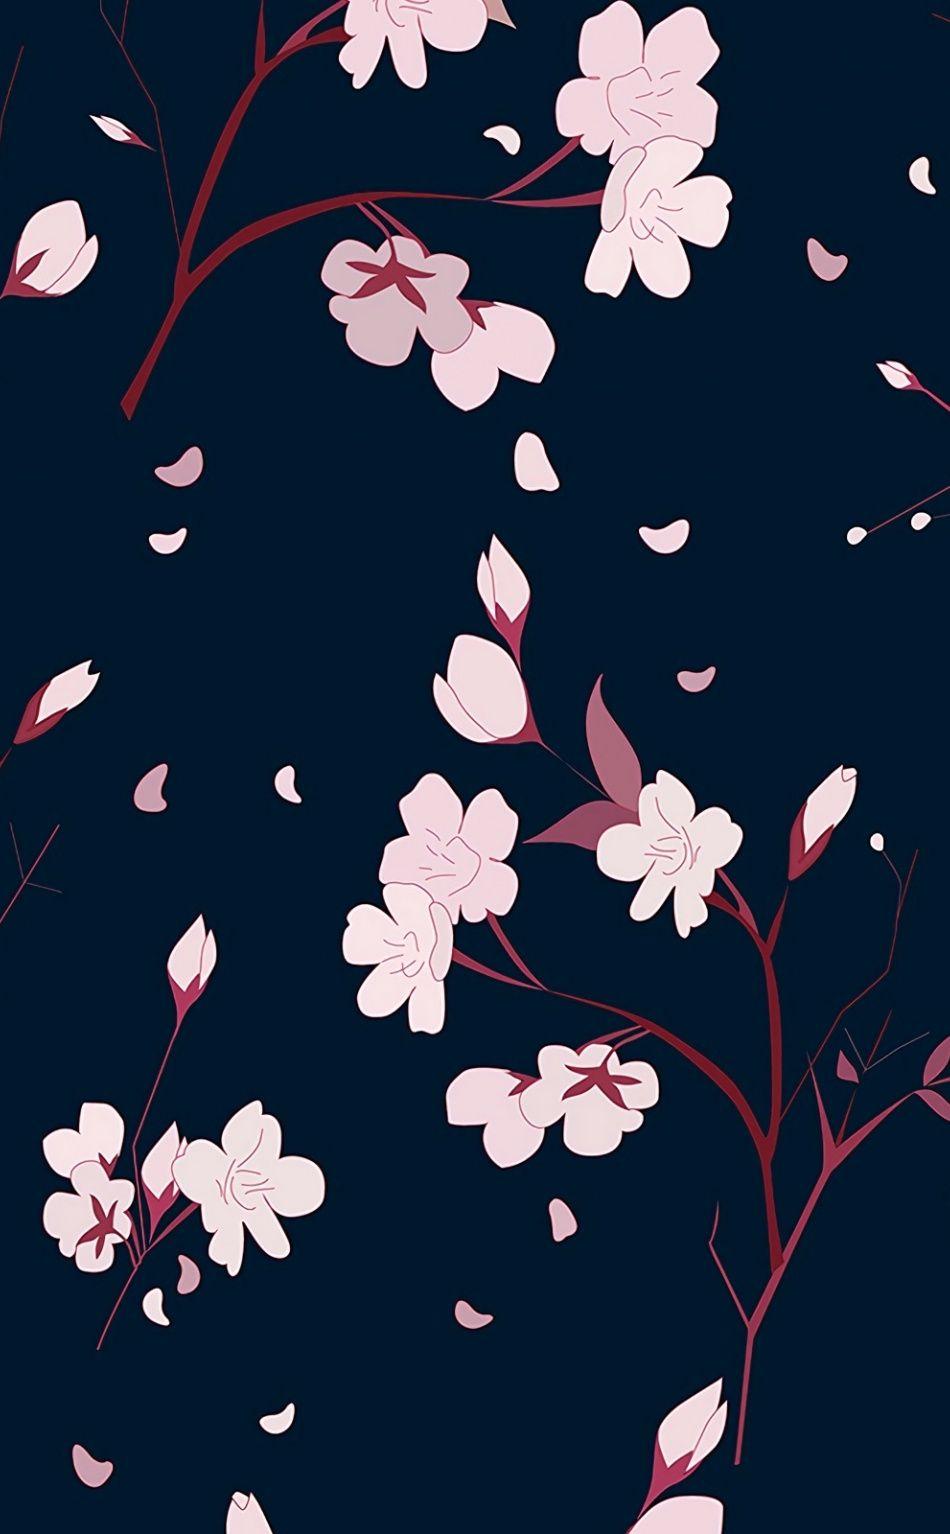 Pink flowers, digital art, pattern, abstract, 950x1534 wallpaper